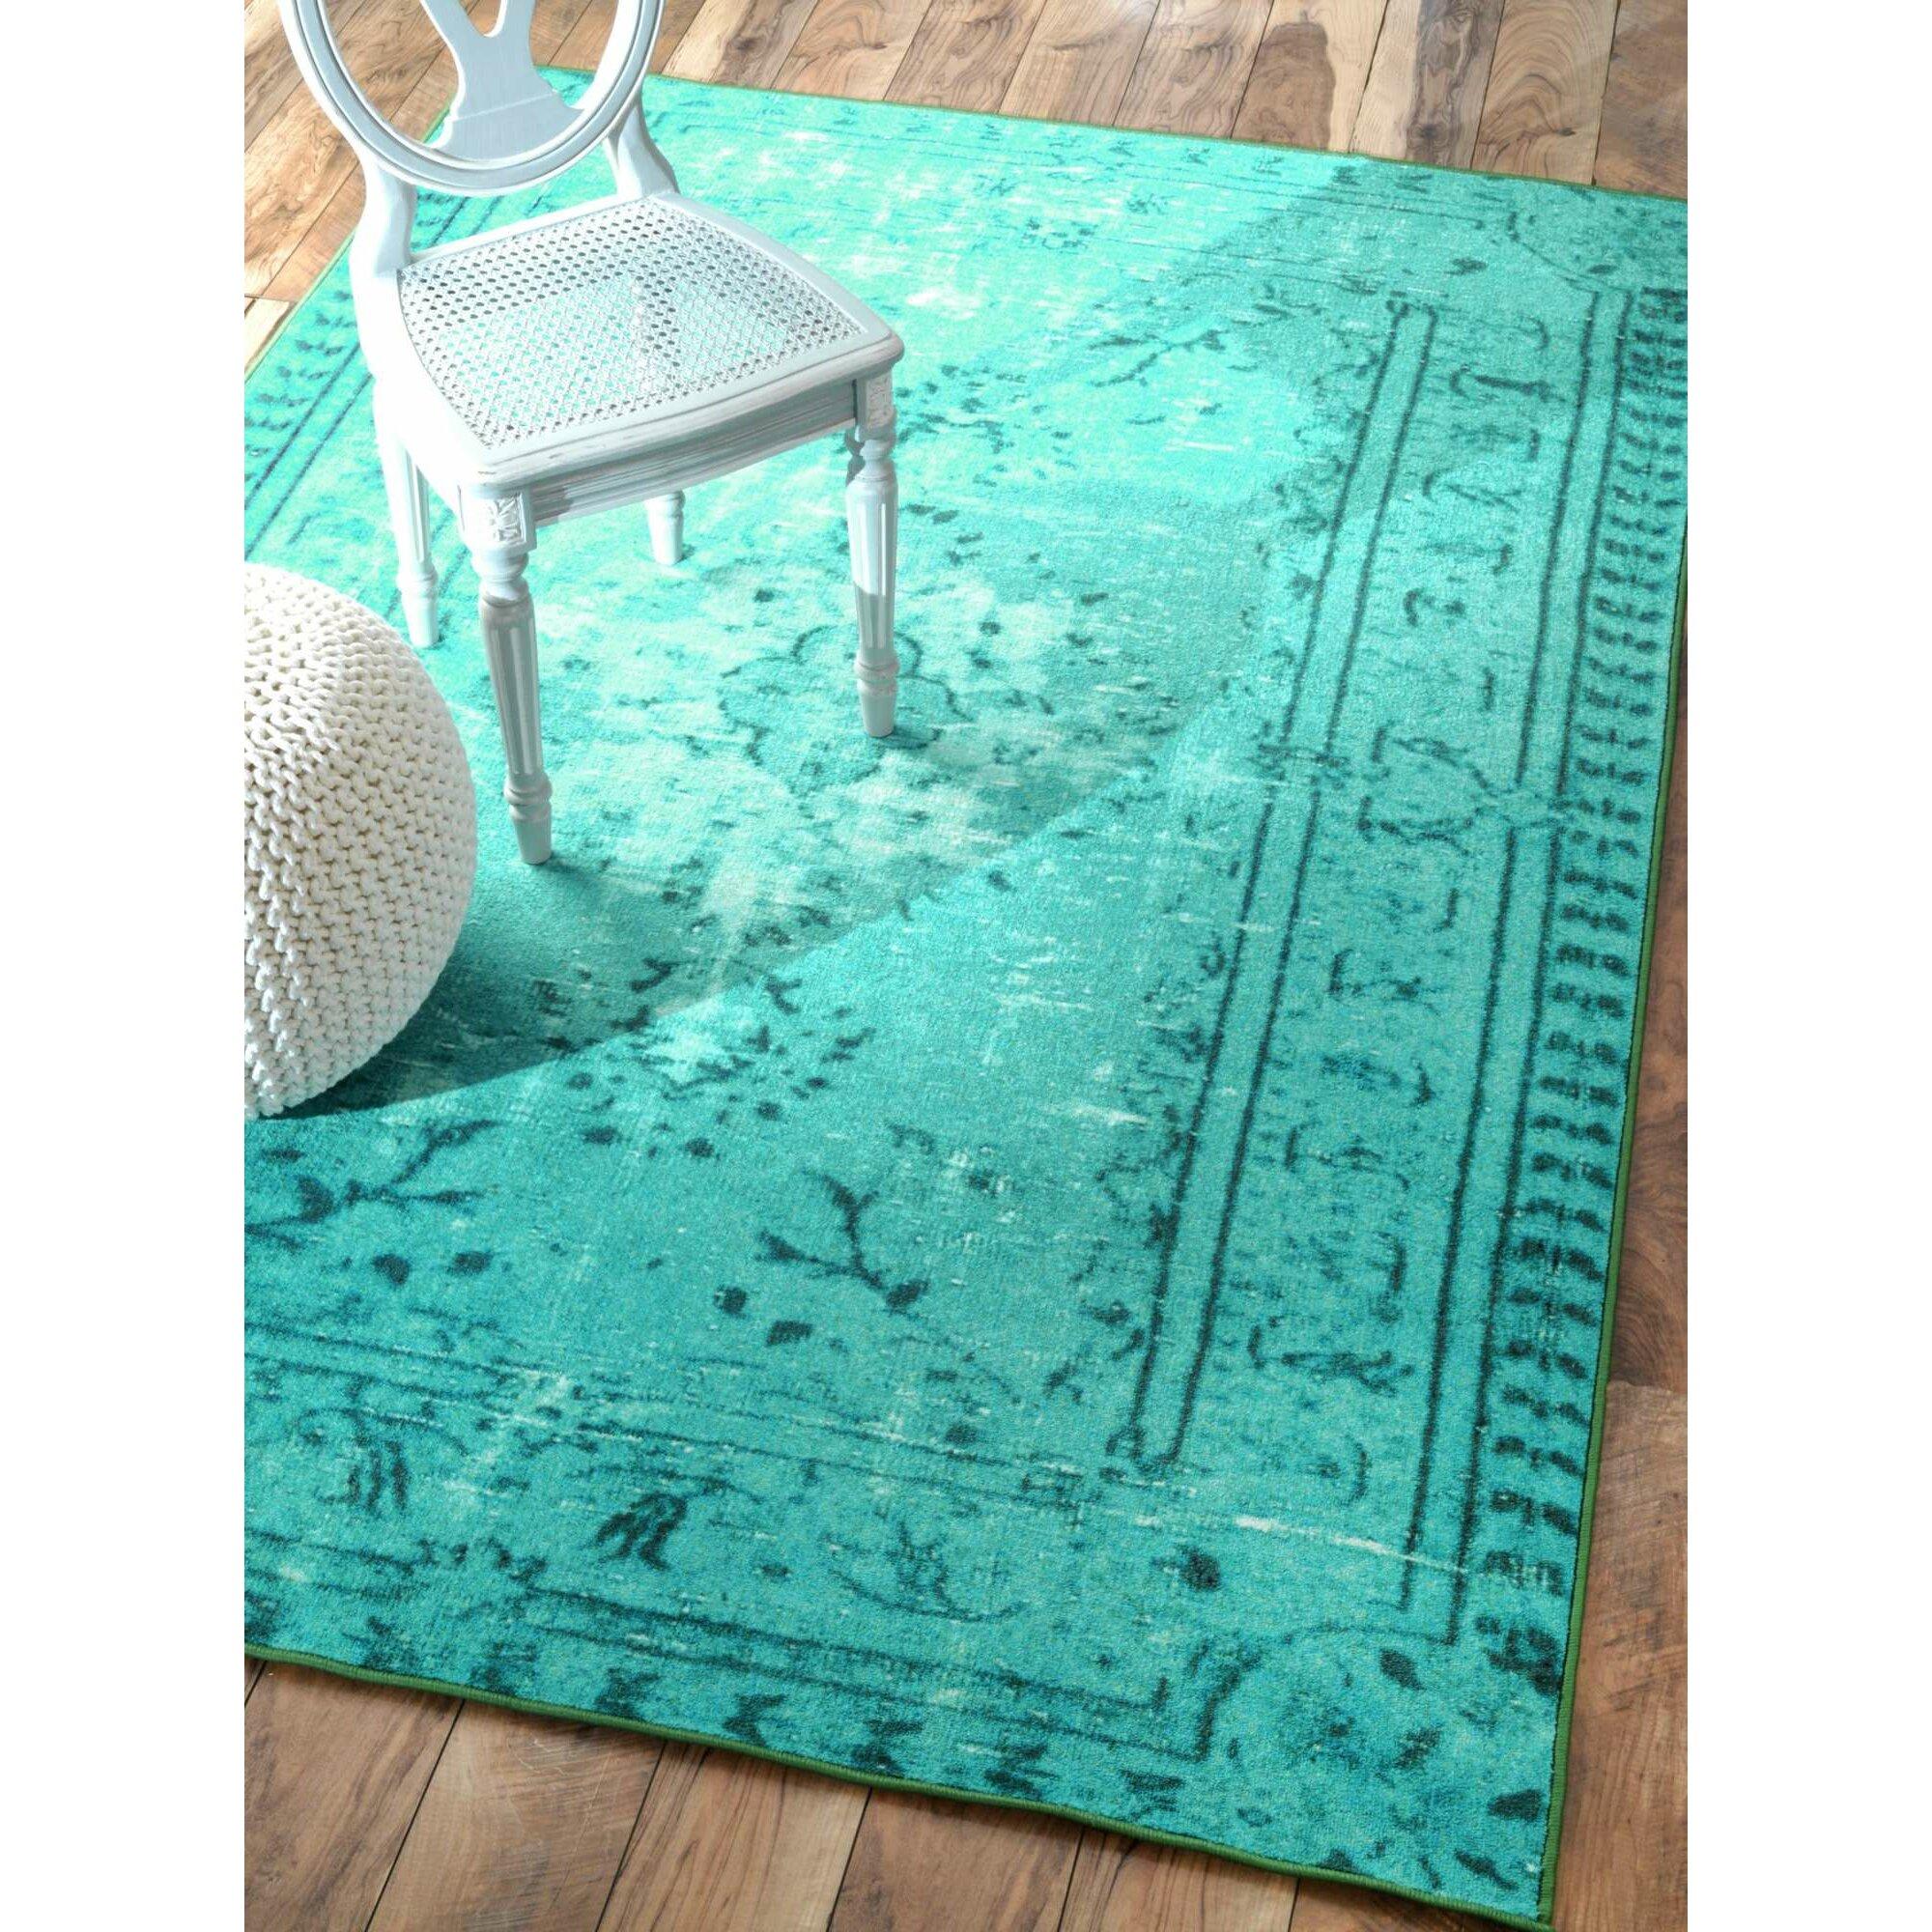 Saleya Turquoise Area Rug: Zoubir Turquoise Area Rug & Reviews